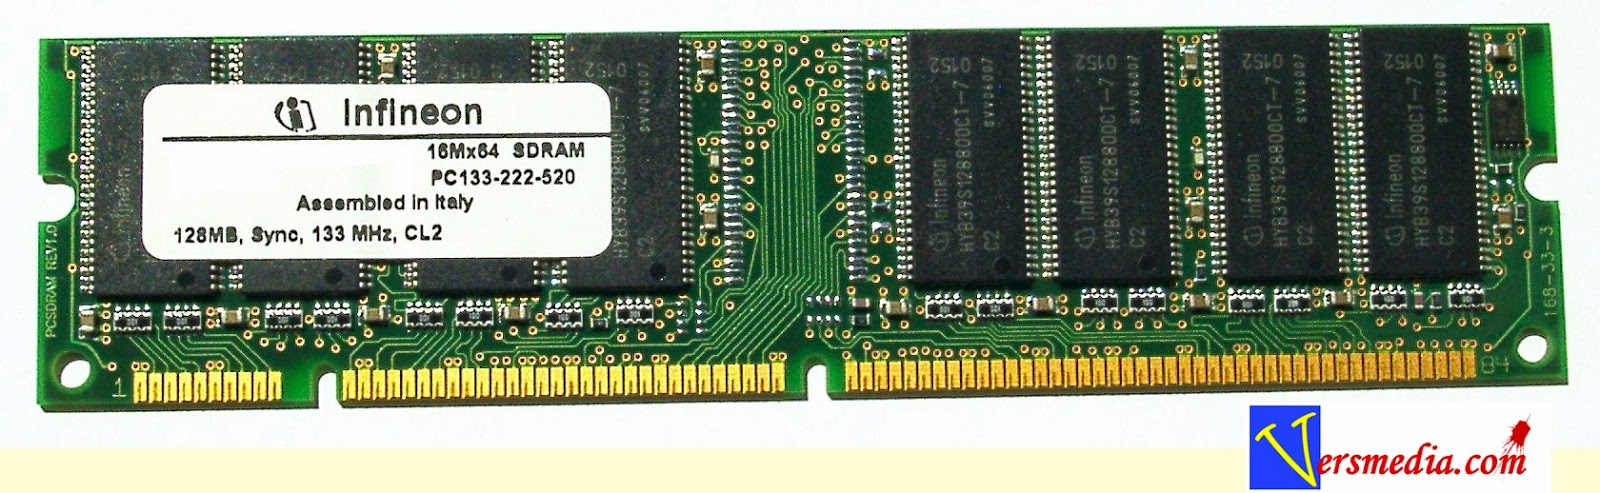 SD RAM Synchronous Dynamic Random Access Memory